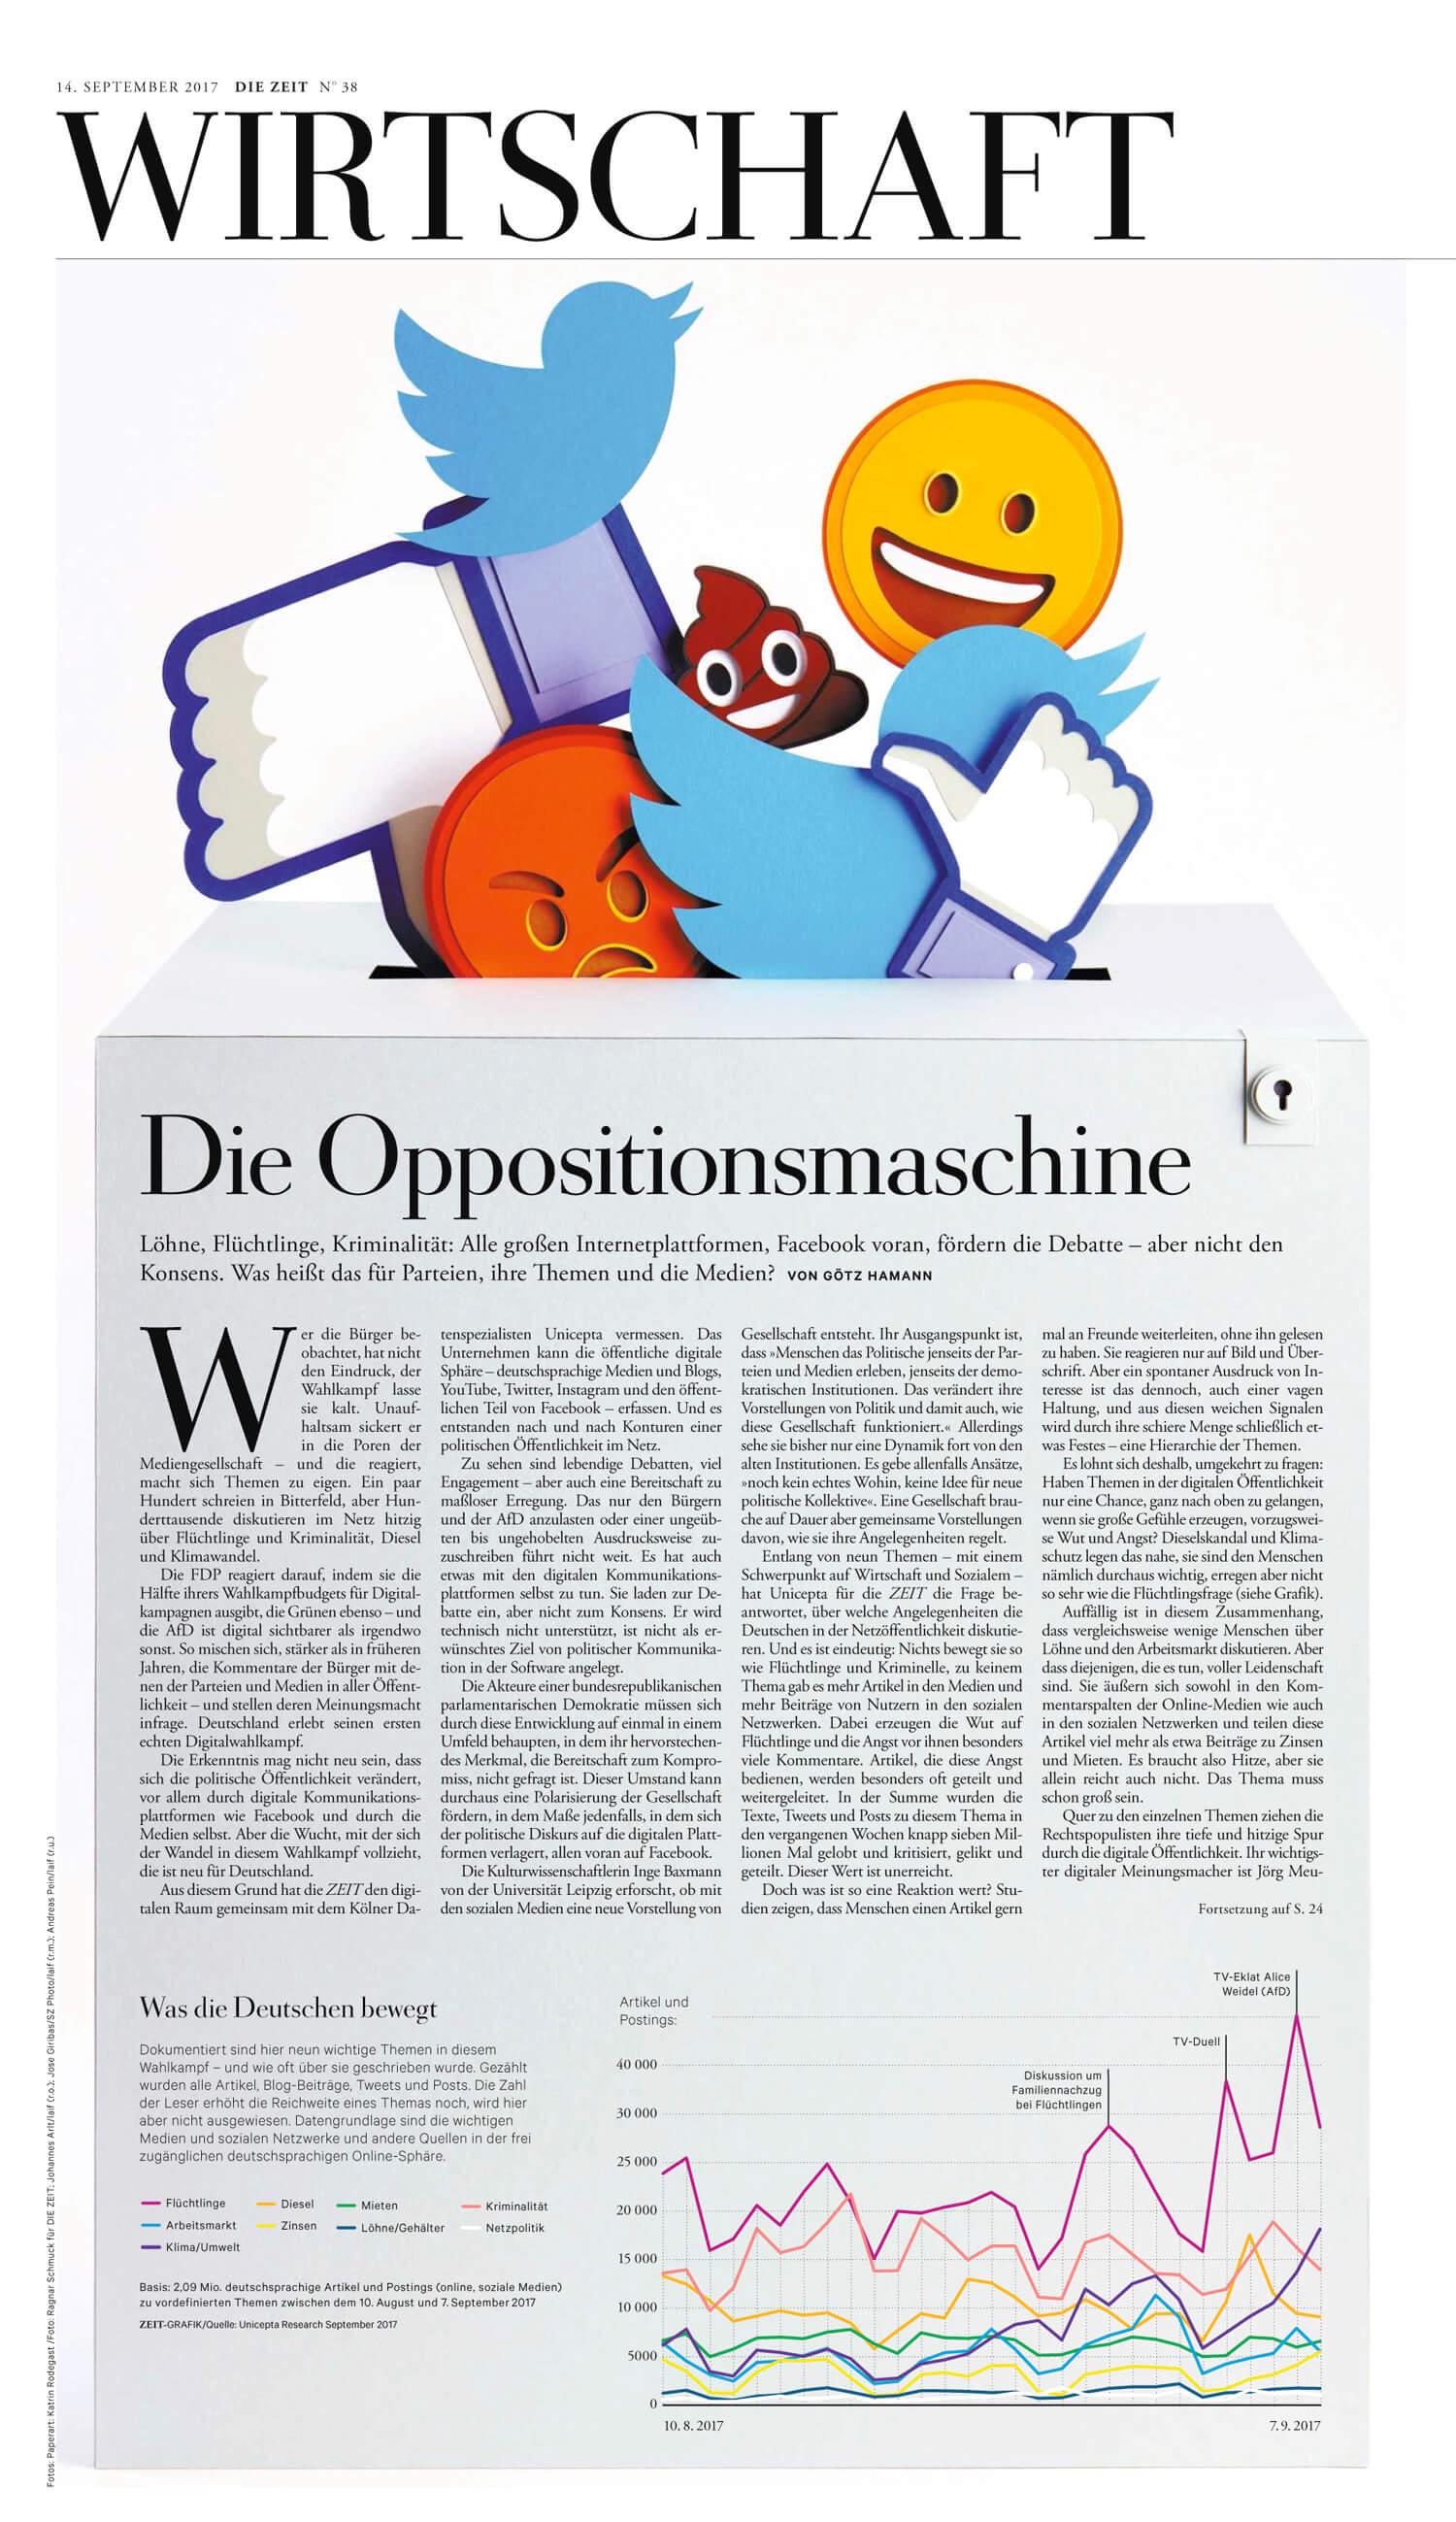 Diezeit_elections_paperart_katrinrodegast_web (1)